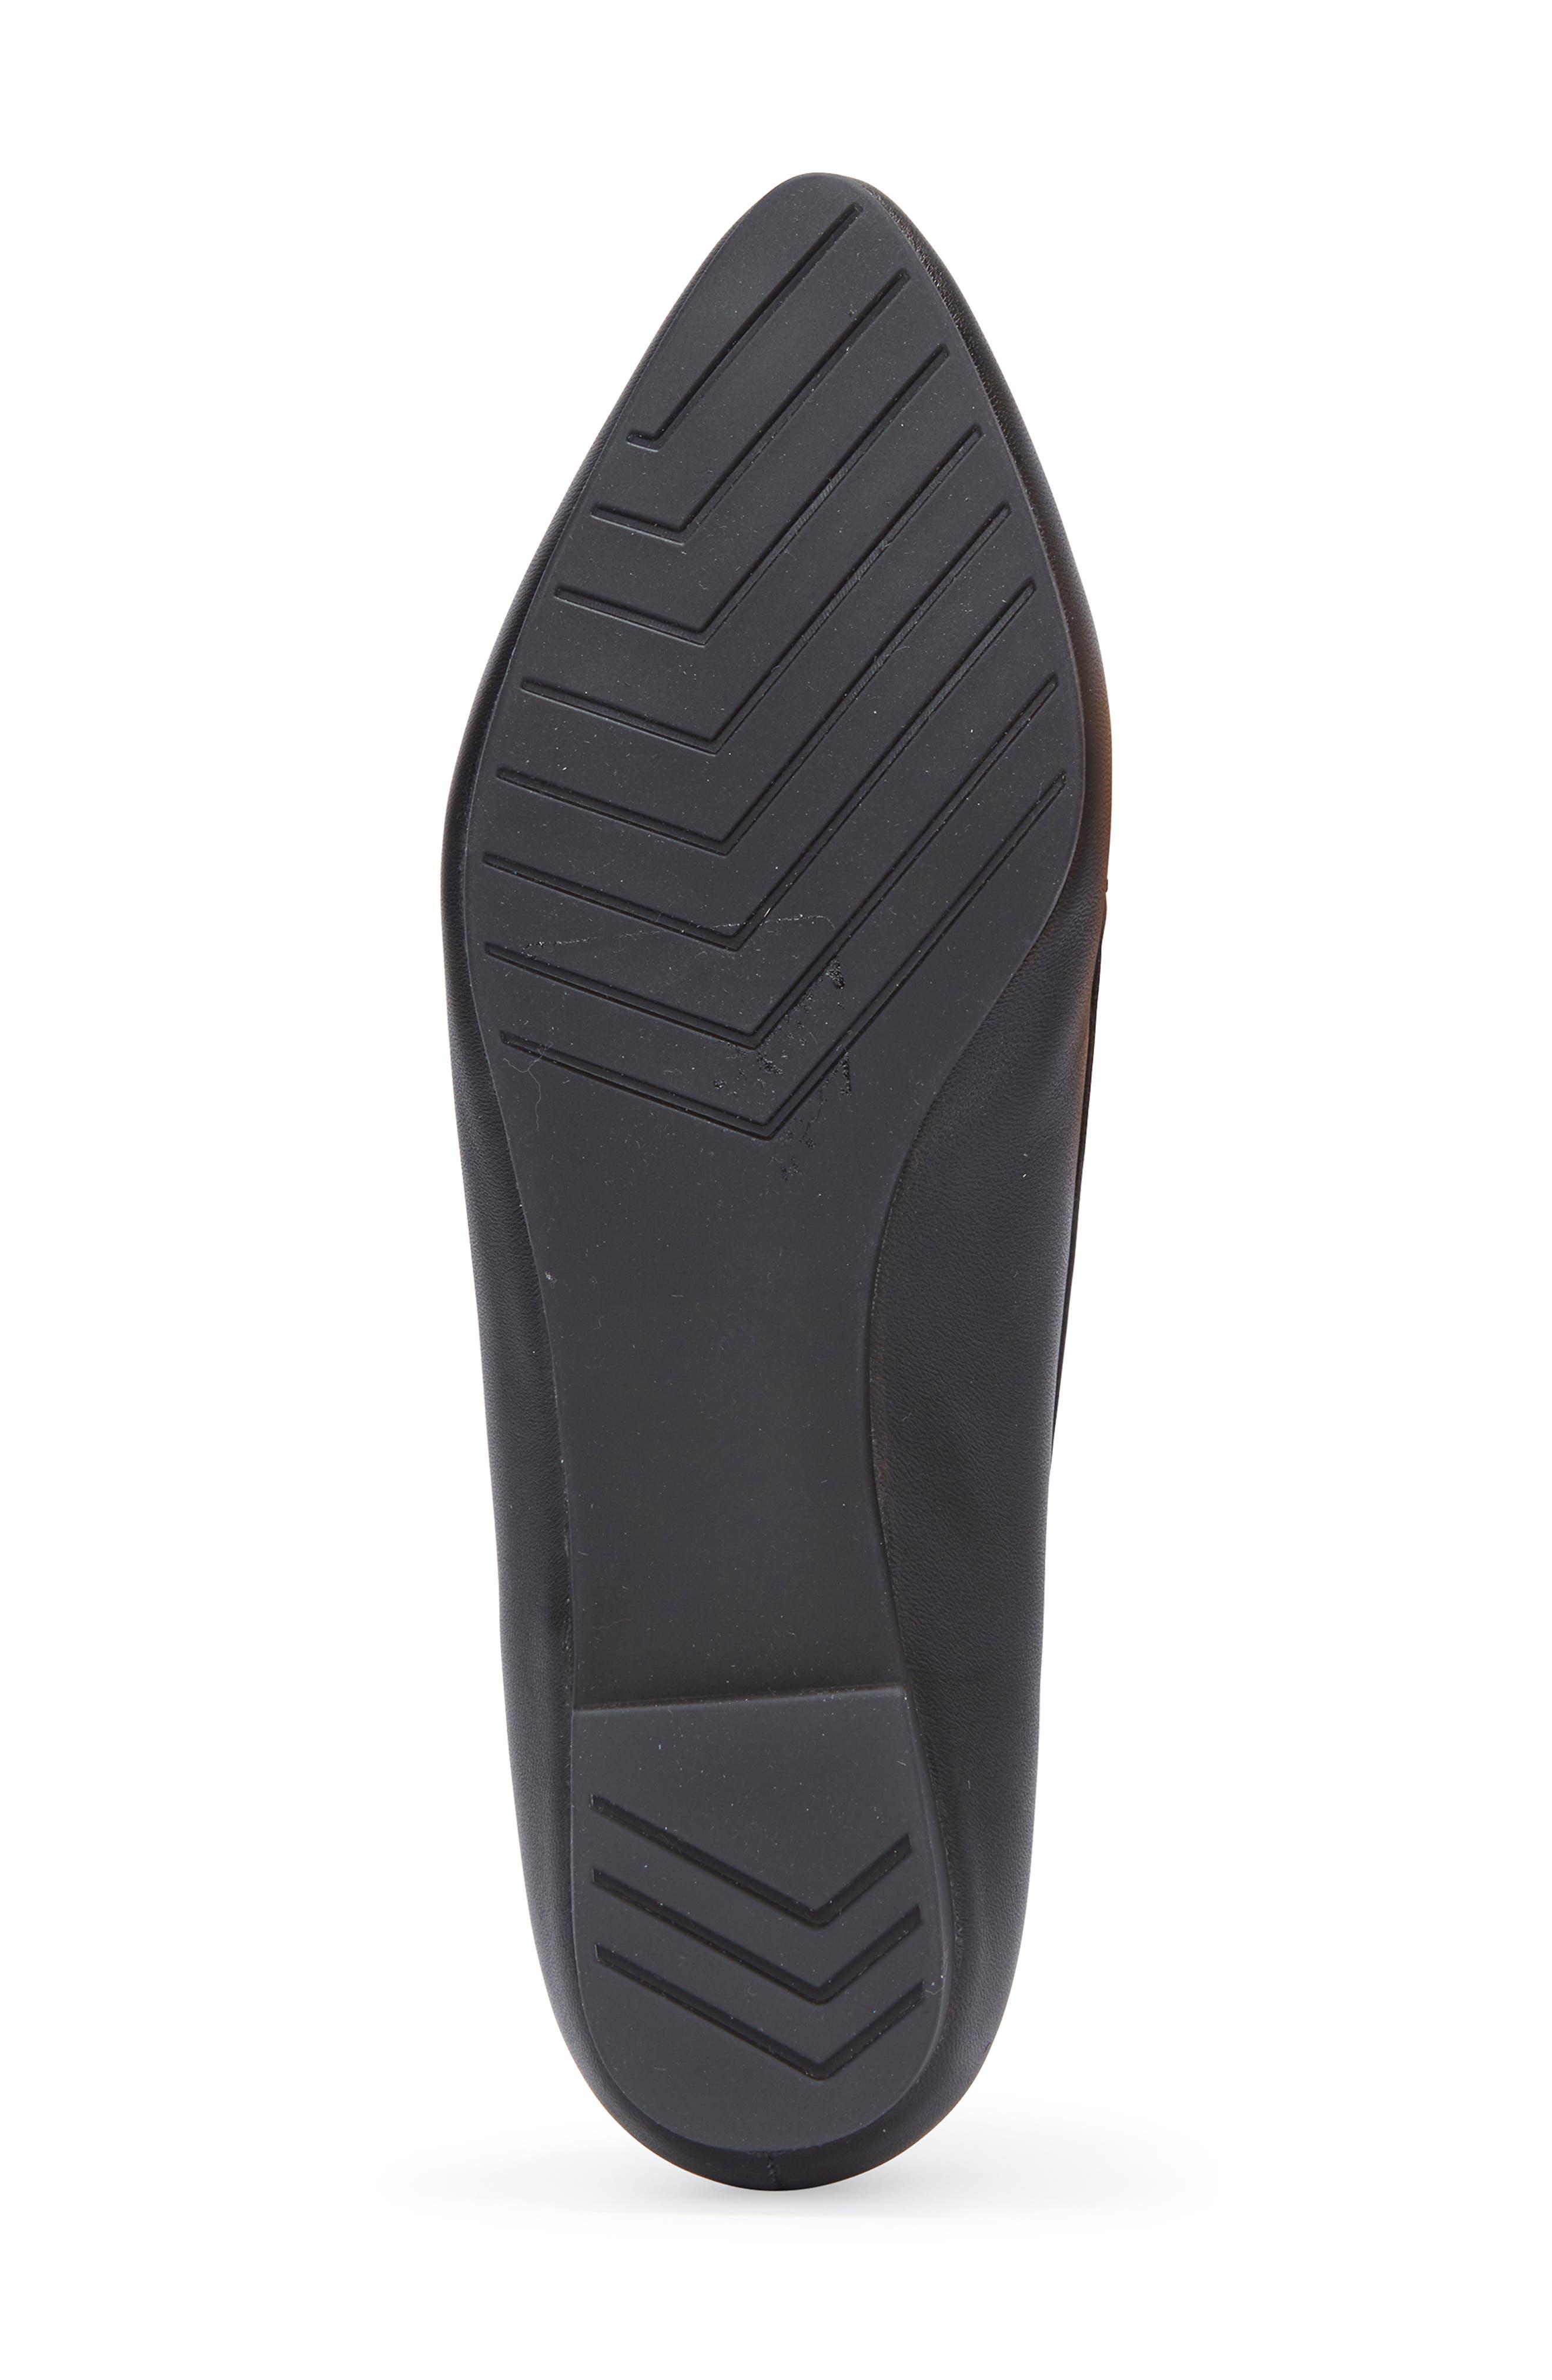 Audra Loafer Flat,                             Alternate thumbnail 6, color,                             BLACK/ BLACK LEATHER